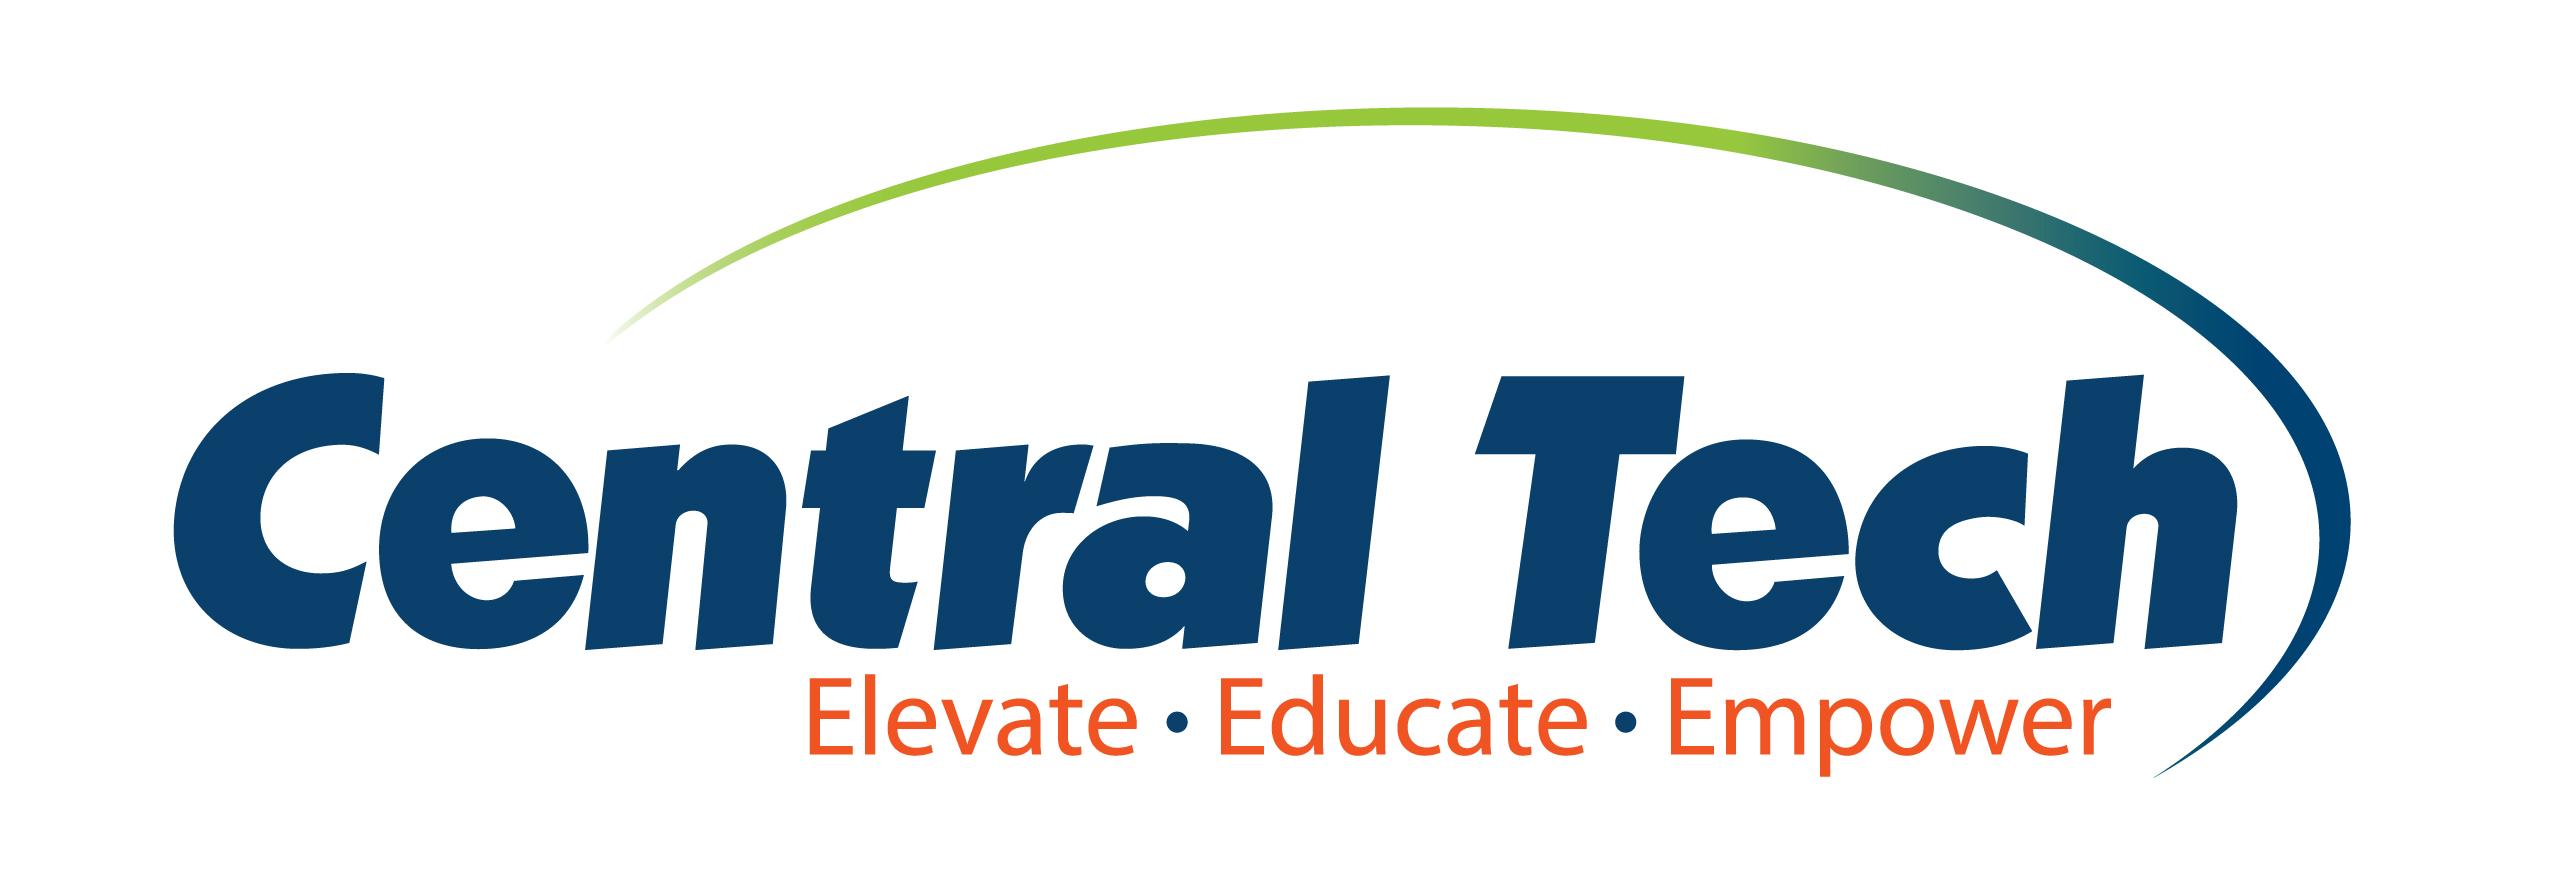 Central Technology Center logo